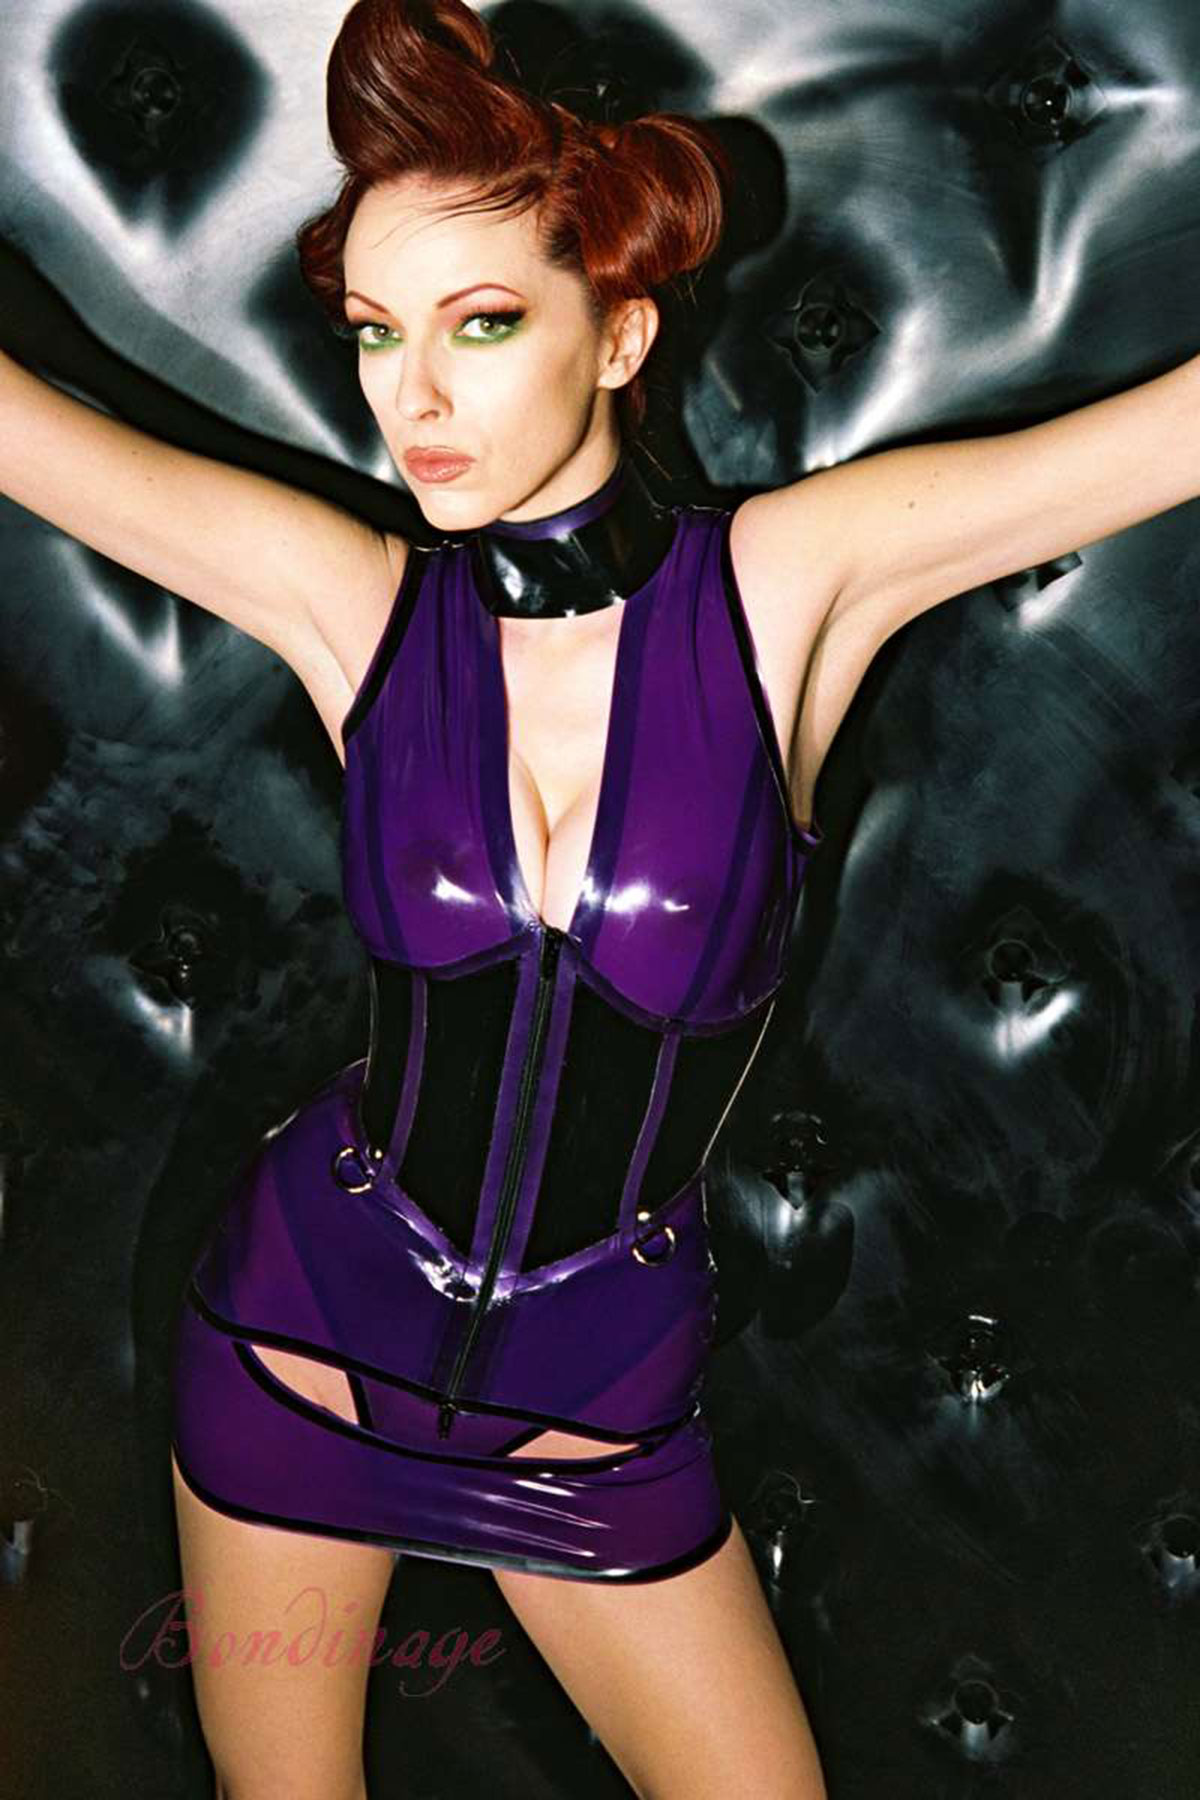 That translucent latex dress suggest